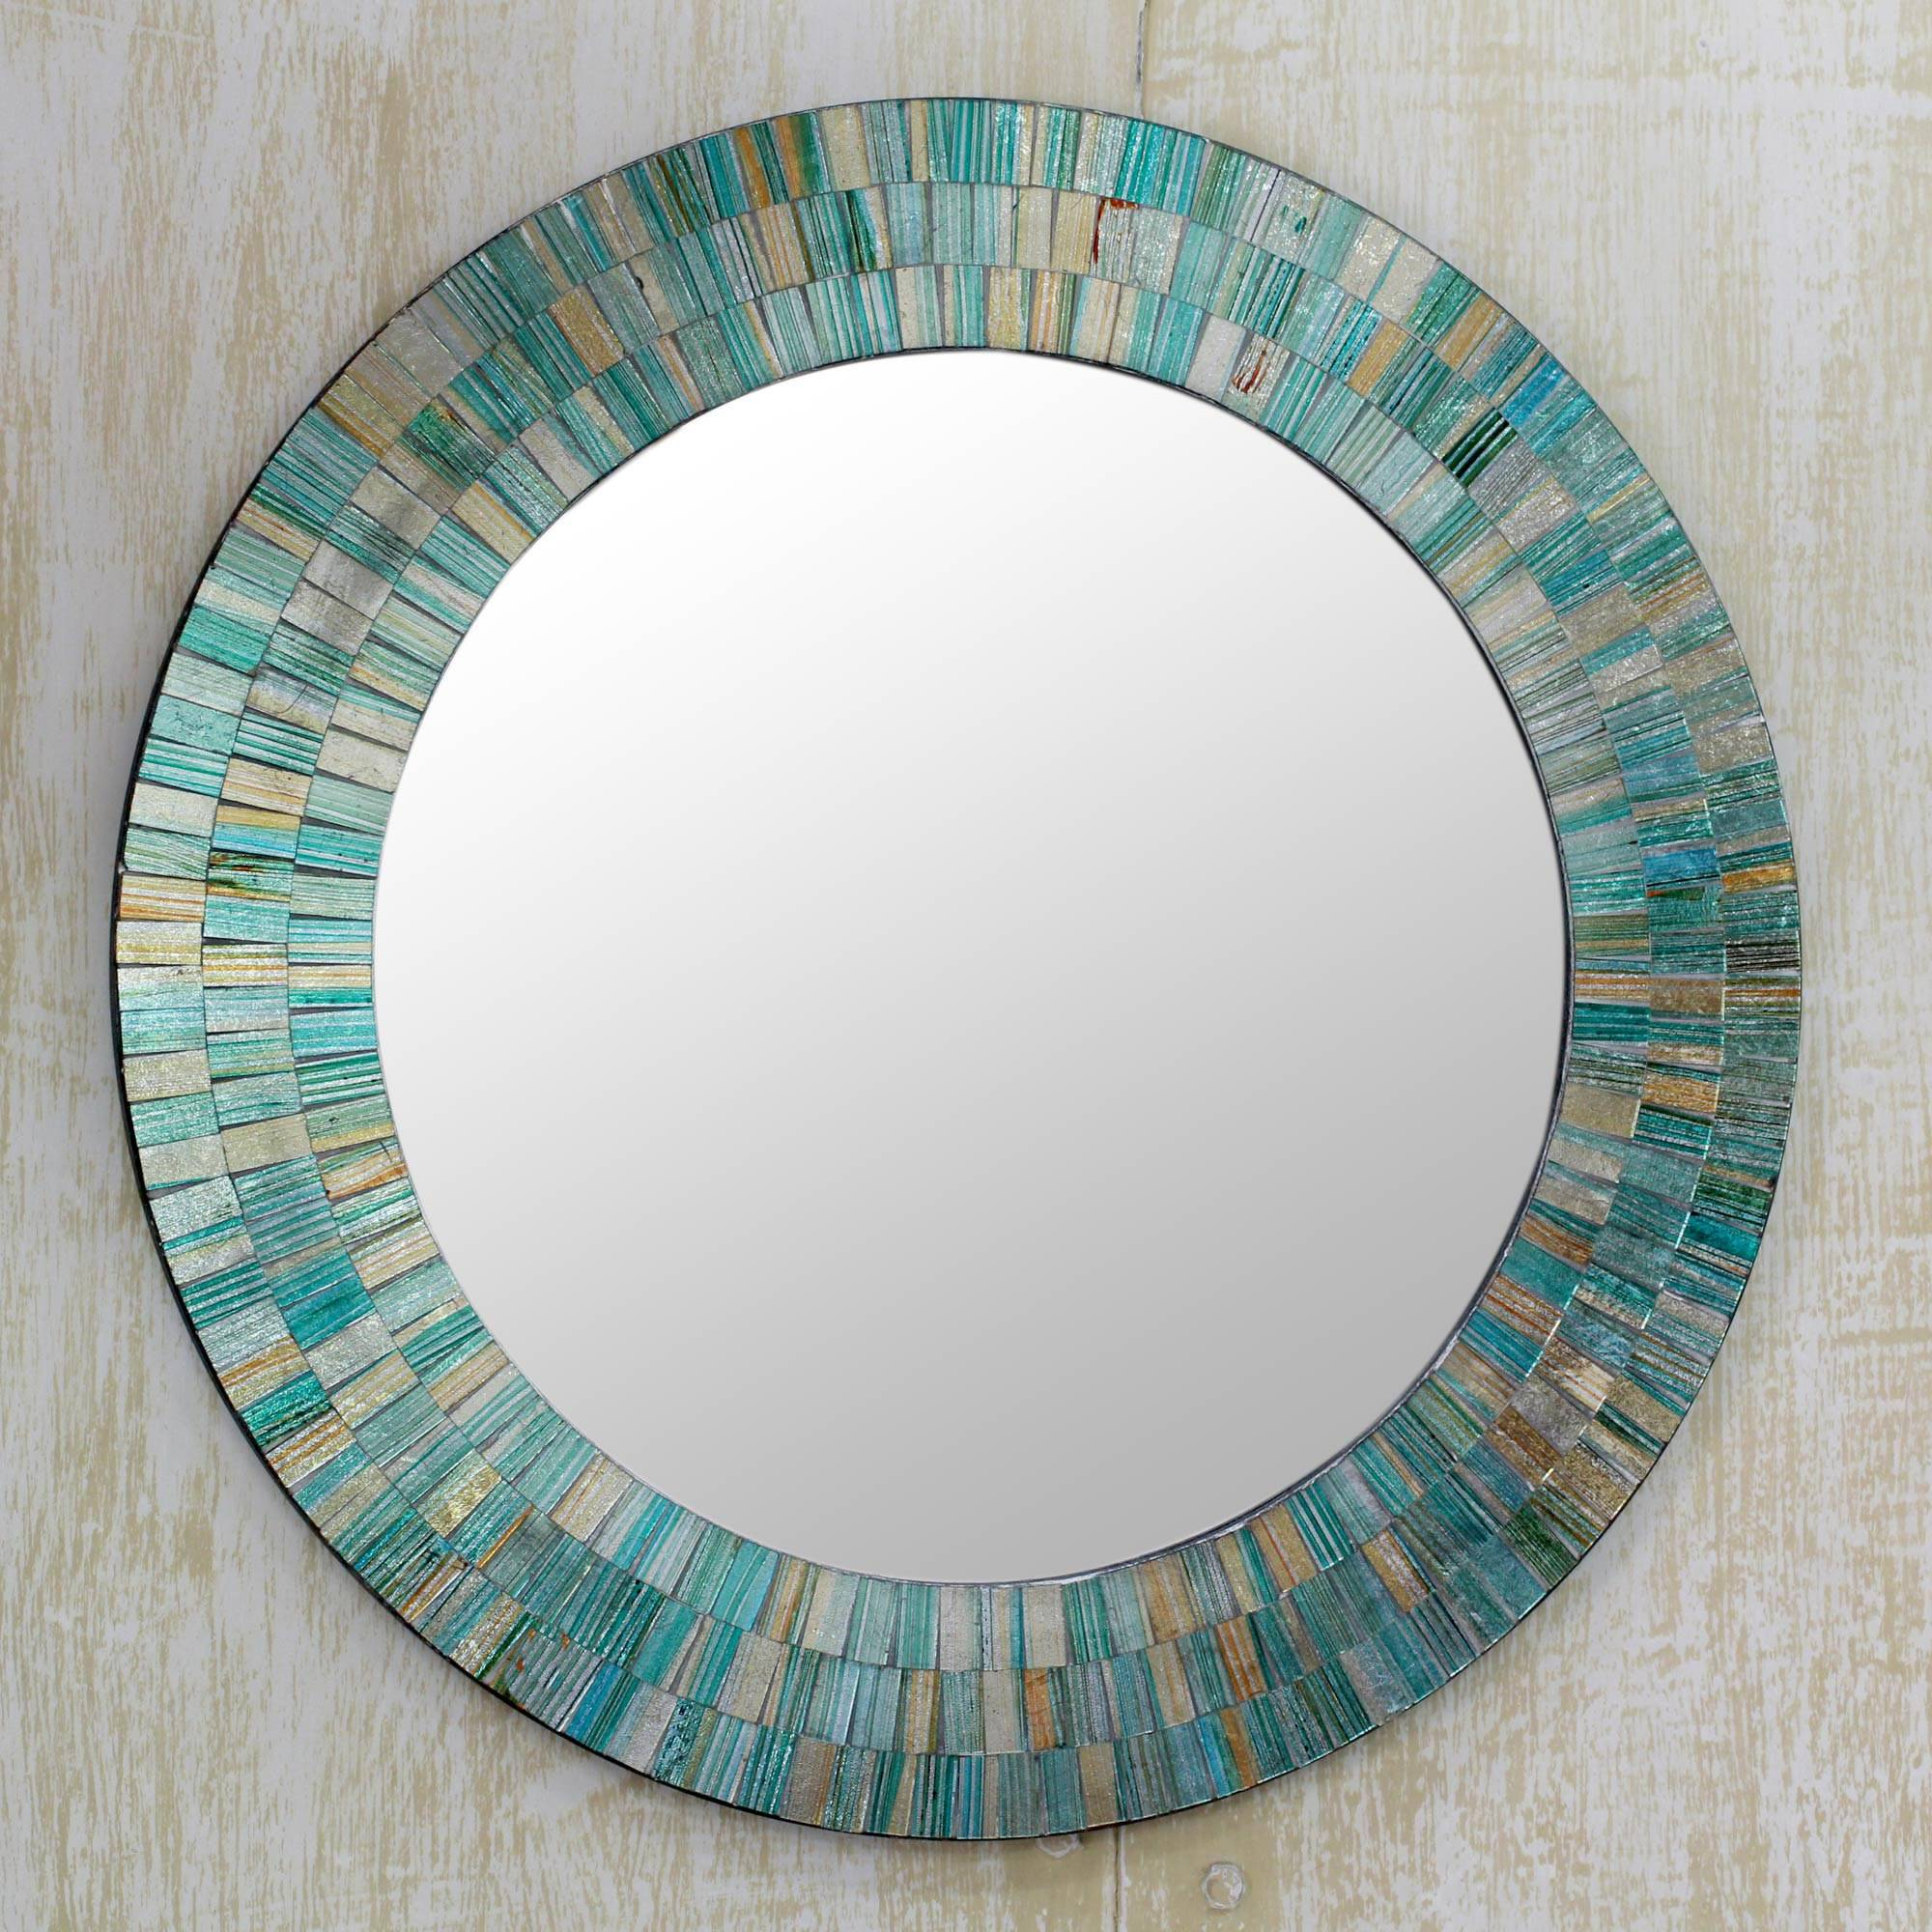 Aqua Fantasy Hand Made Mosaic Wood Glass Mirror Wall Art In Your Home